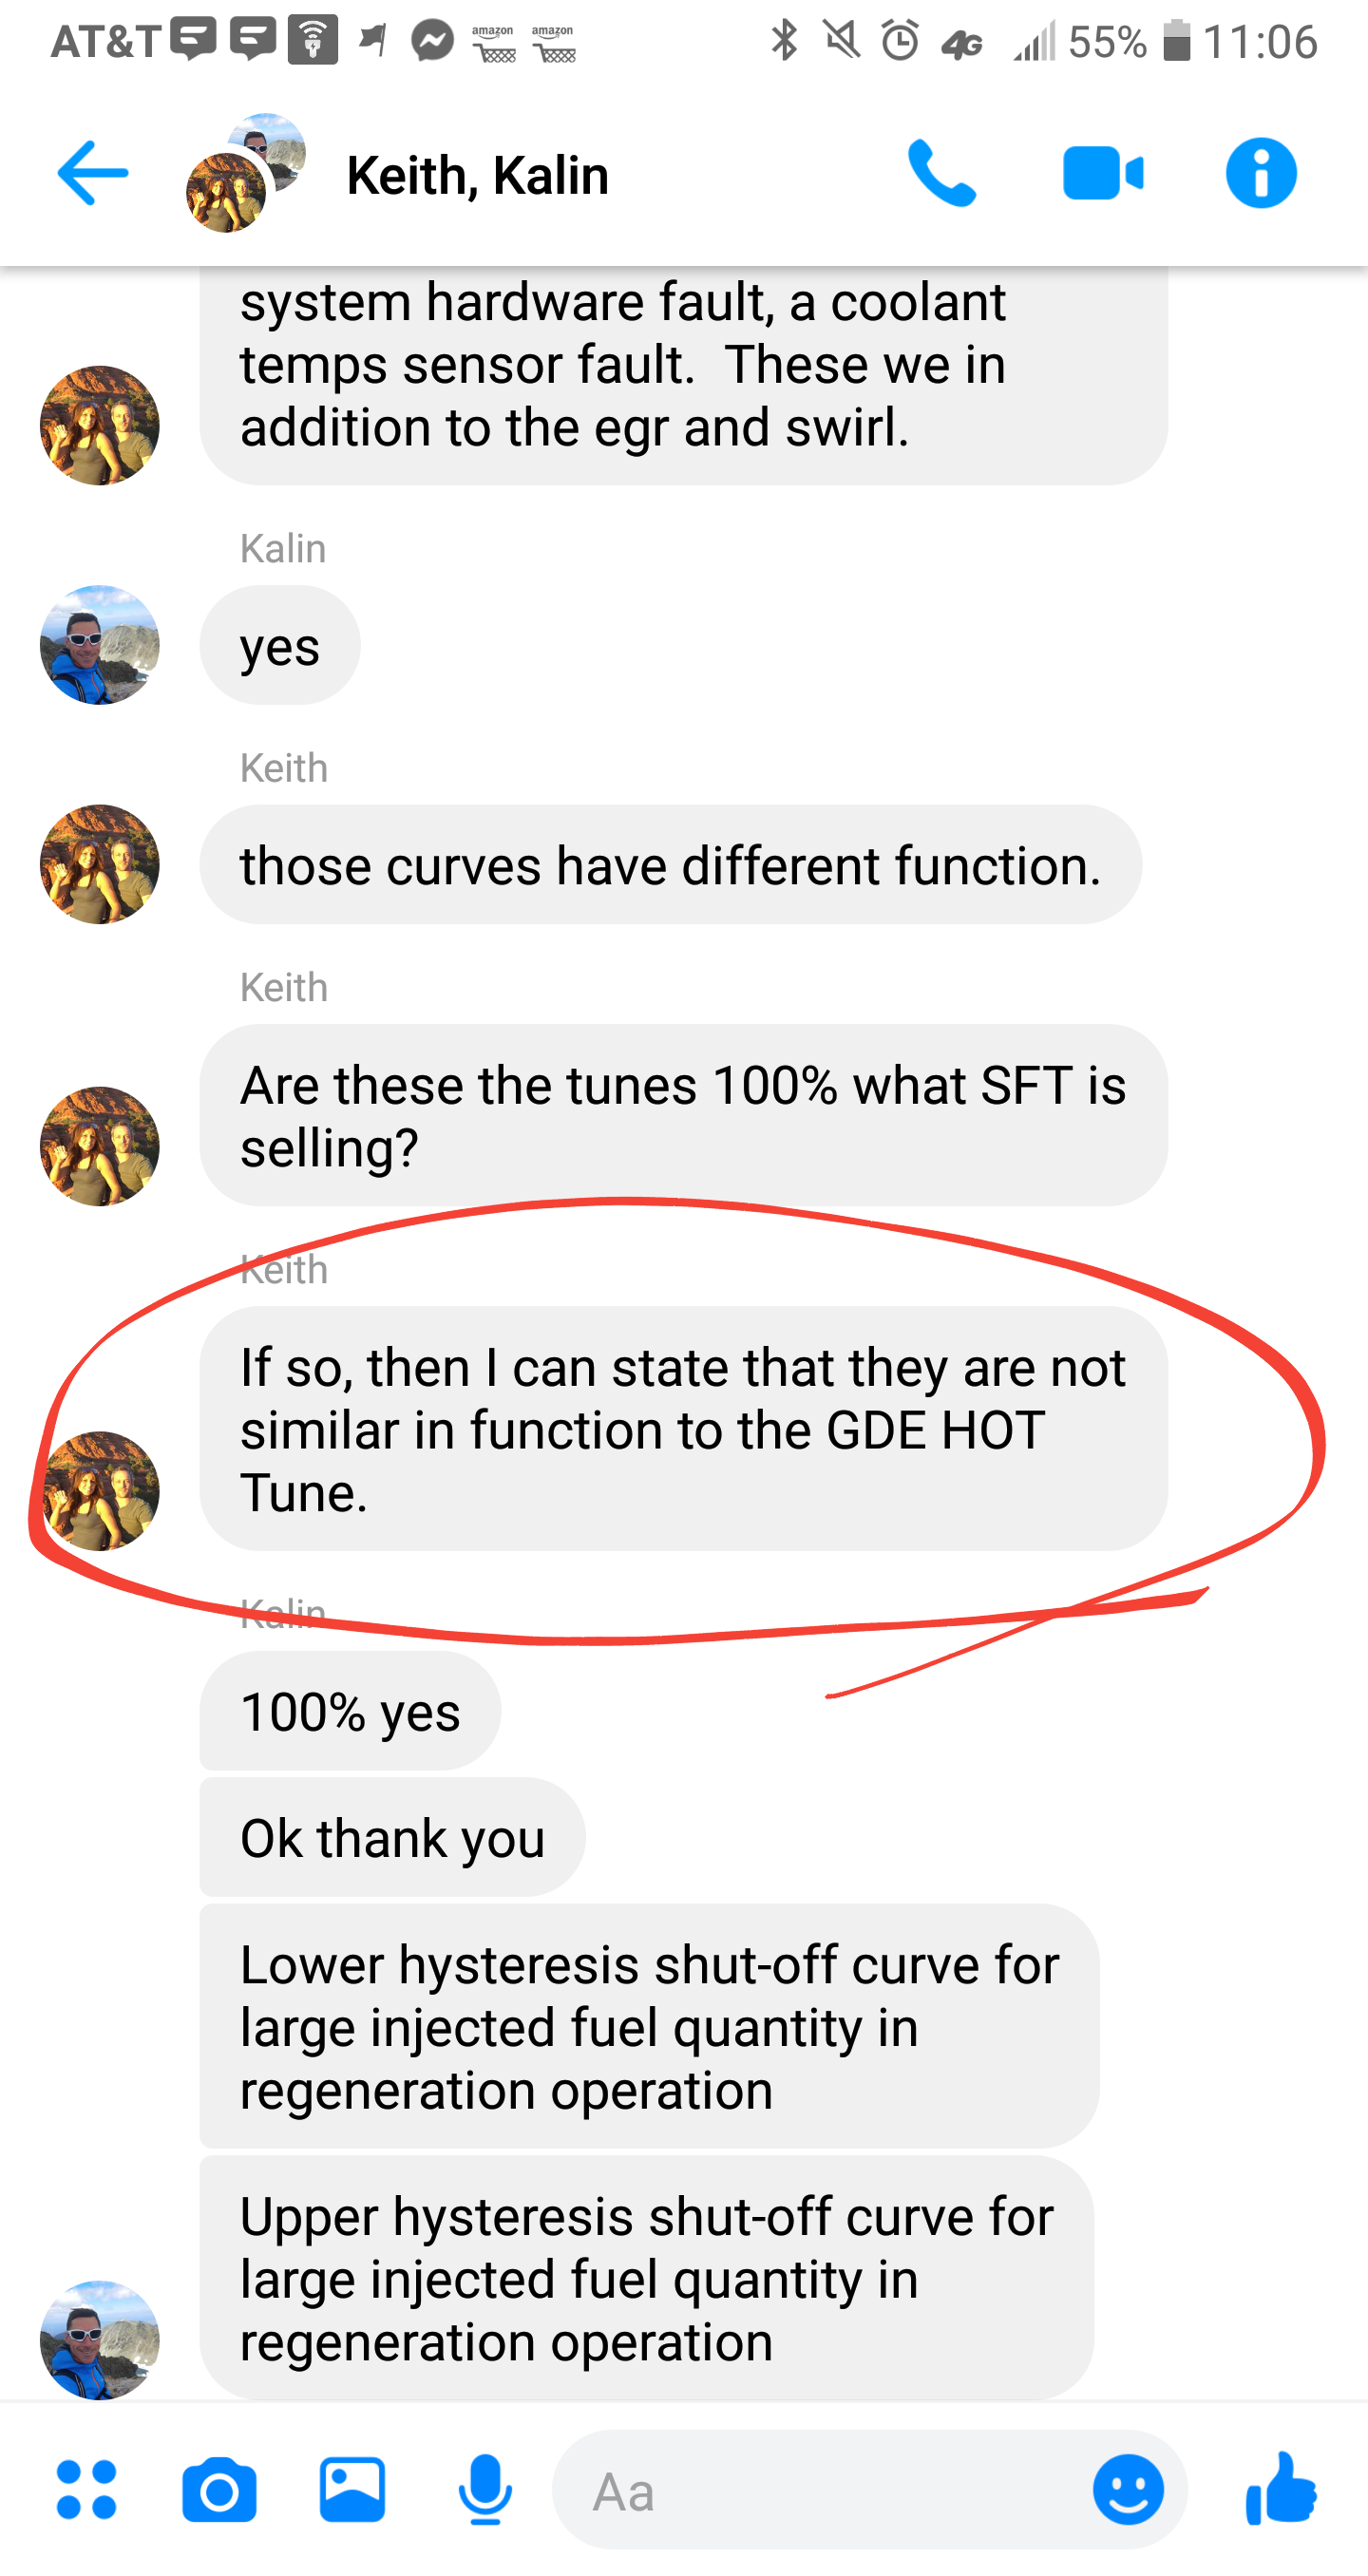 SFT Vs GDE-capture-_2019-05-07-11-06-43.png